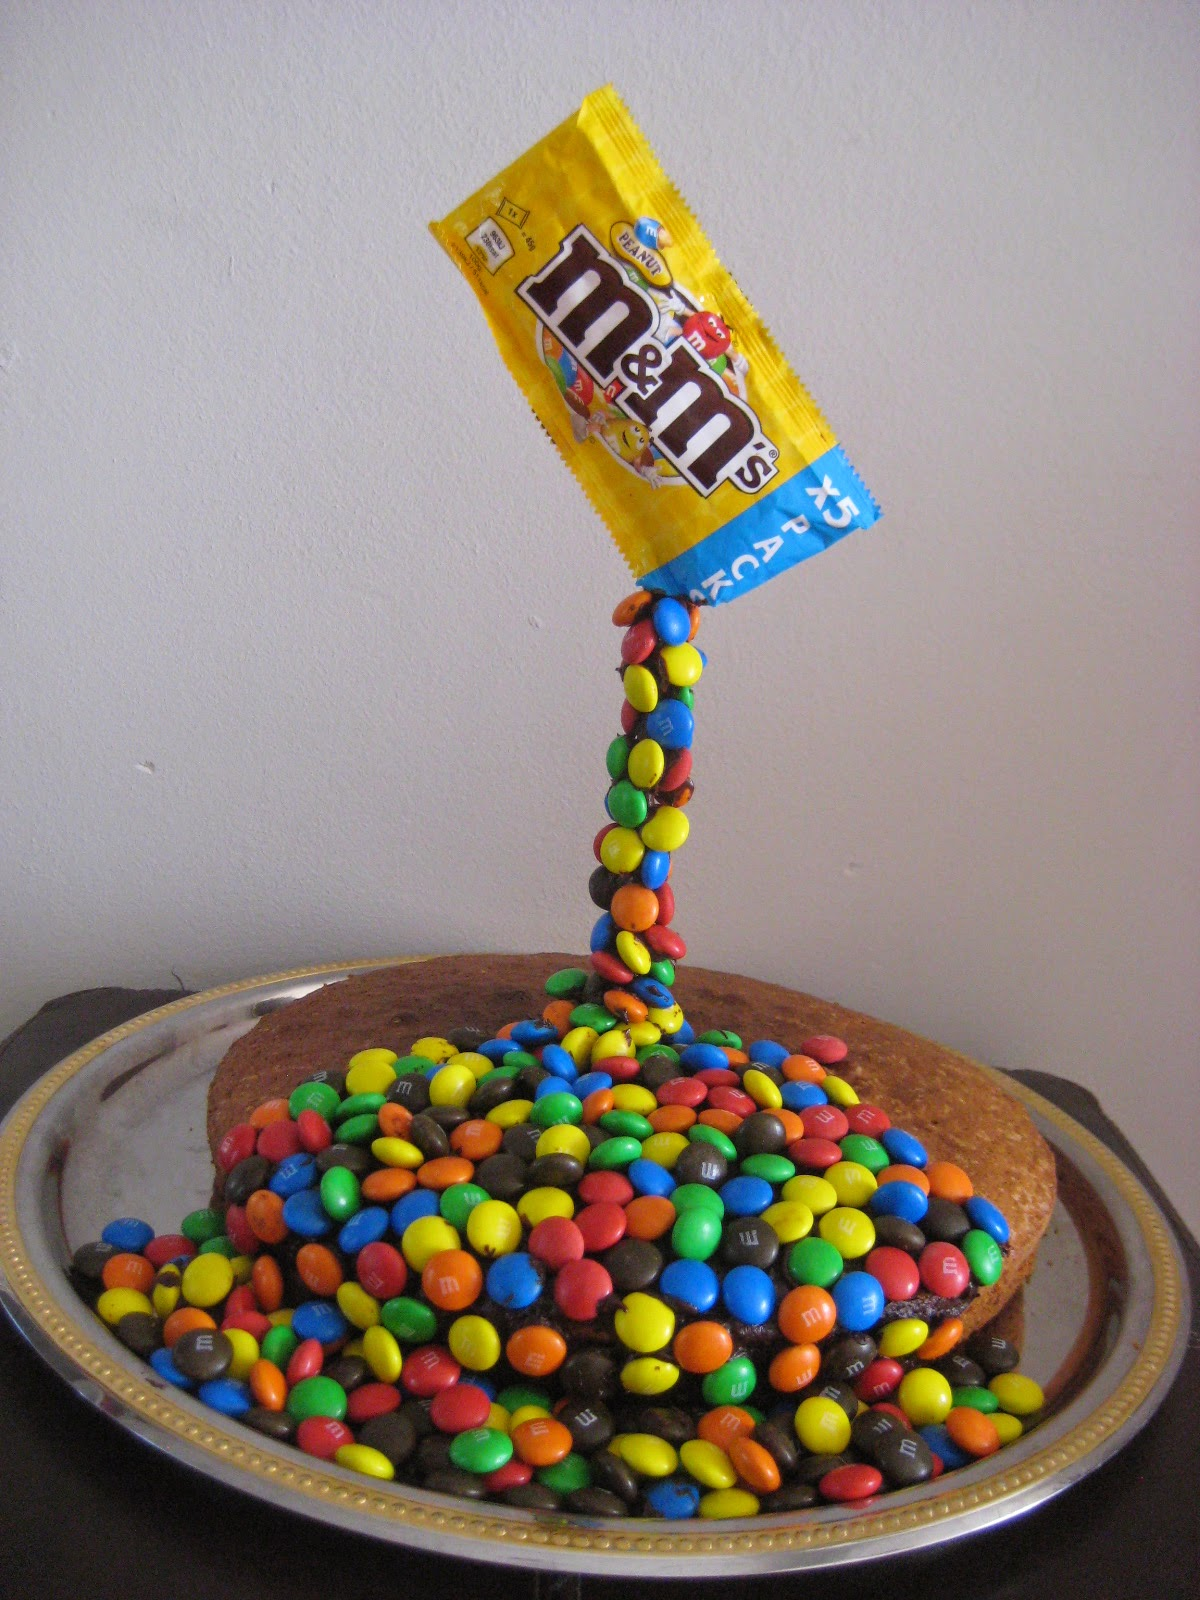 Maman je sais pas quoi faire g teau suspendu gravity cake - Gravity cake noel ...